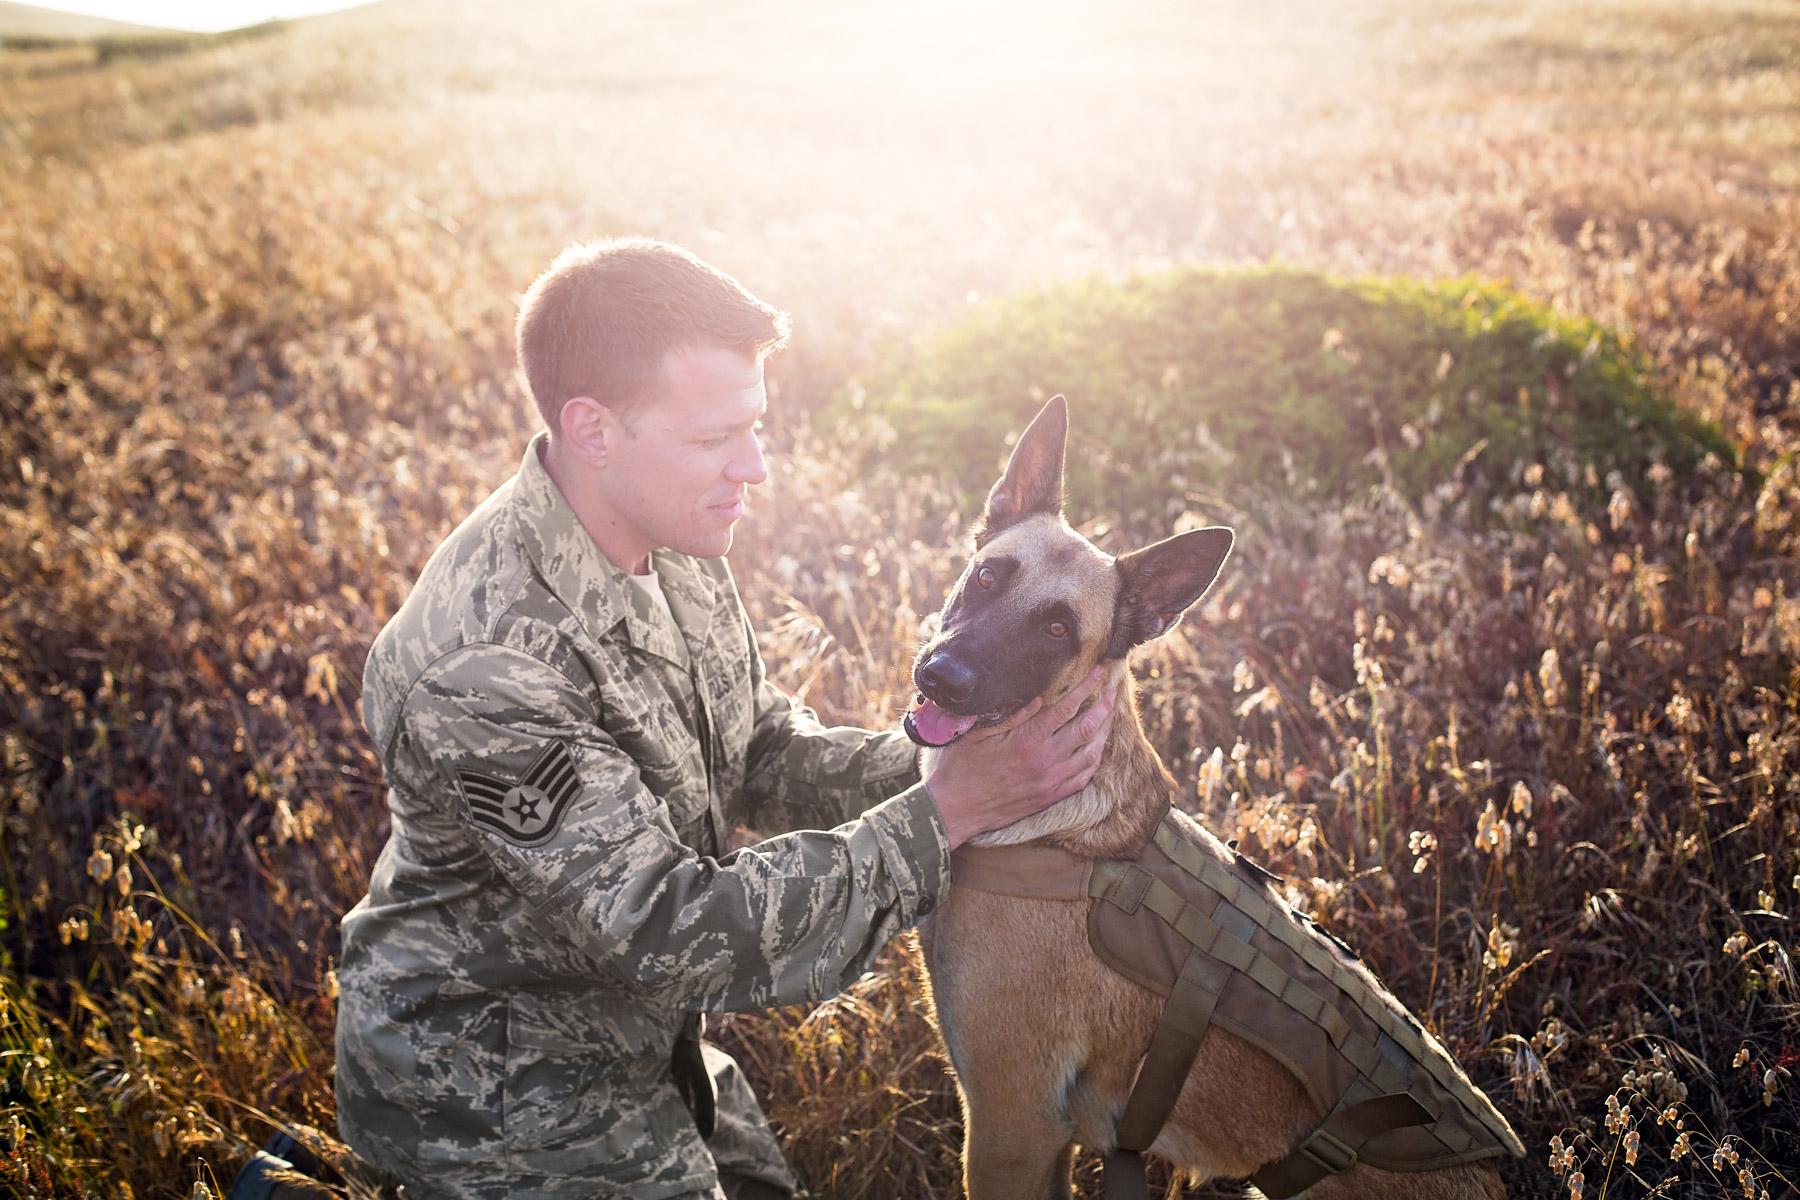 military-man-bonding-with-dog-11.jpg